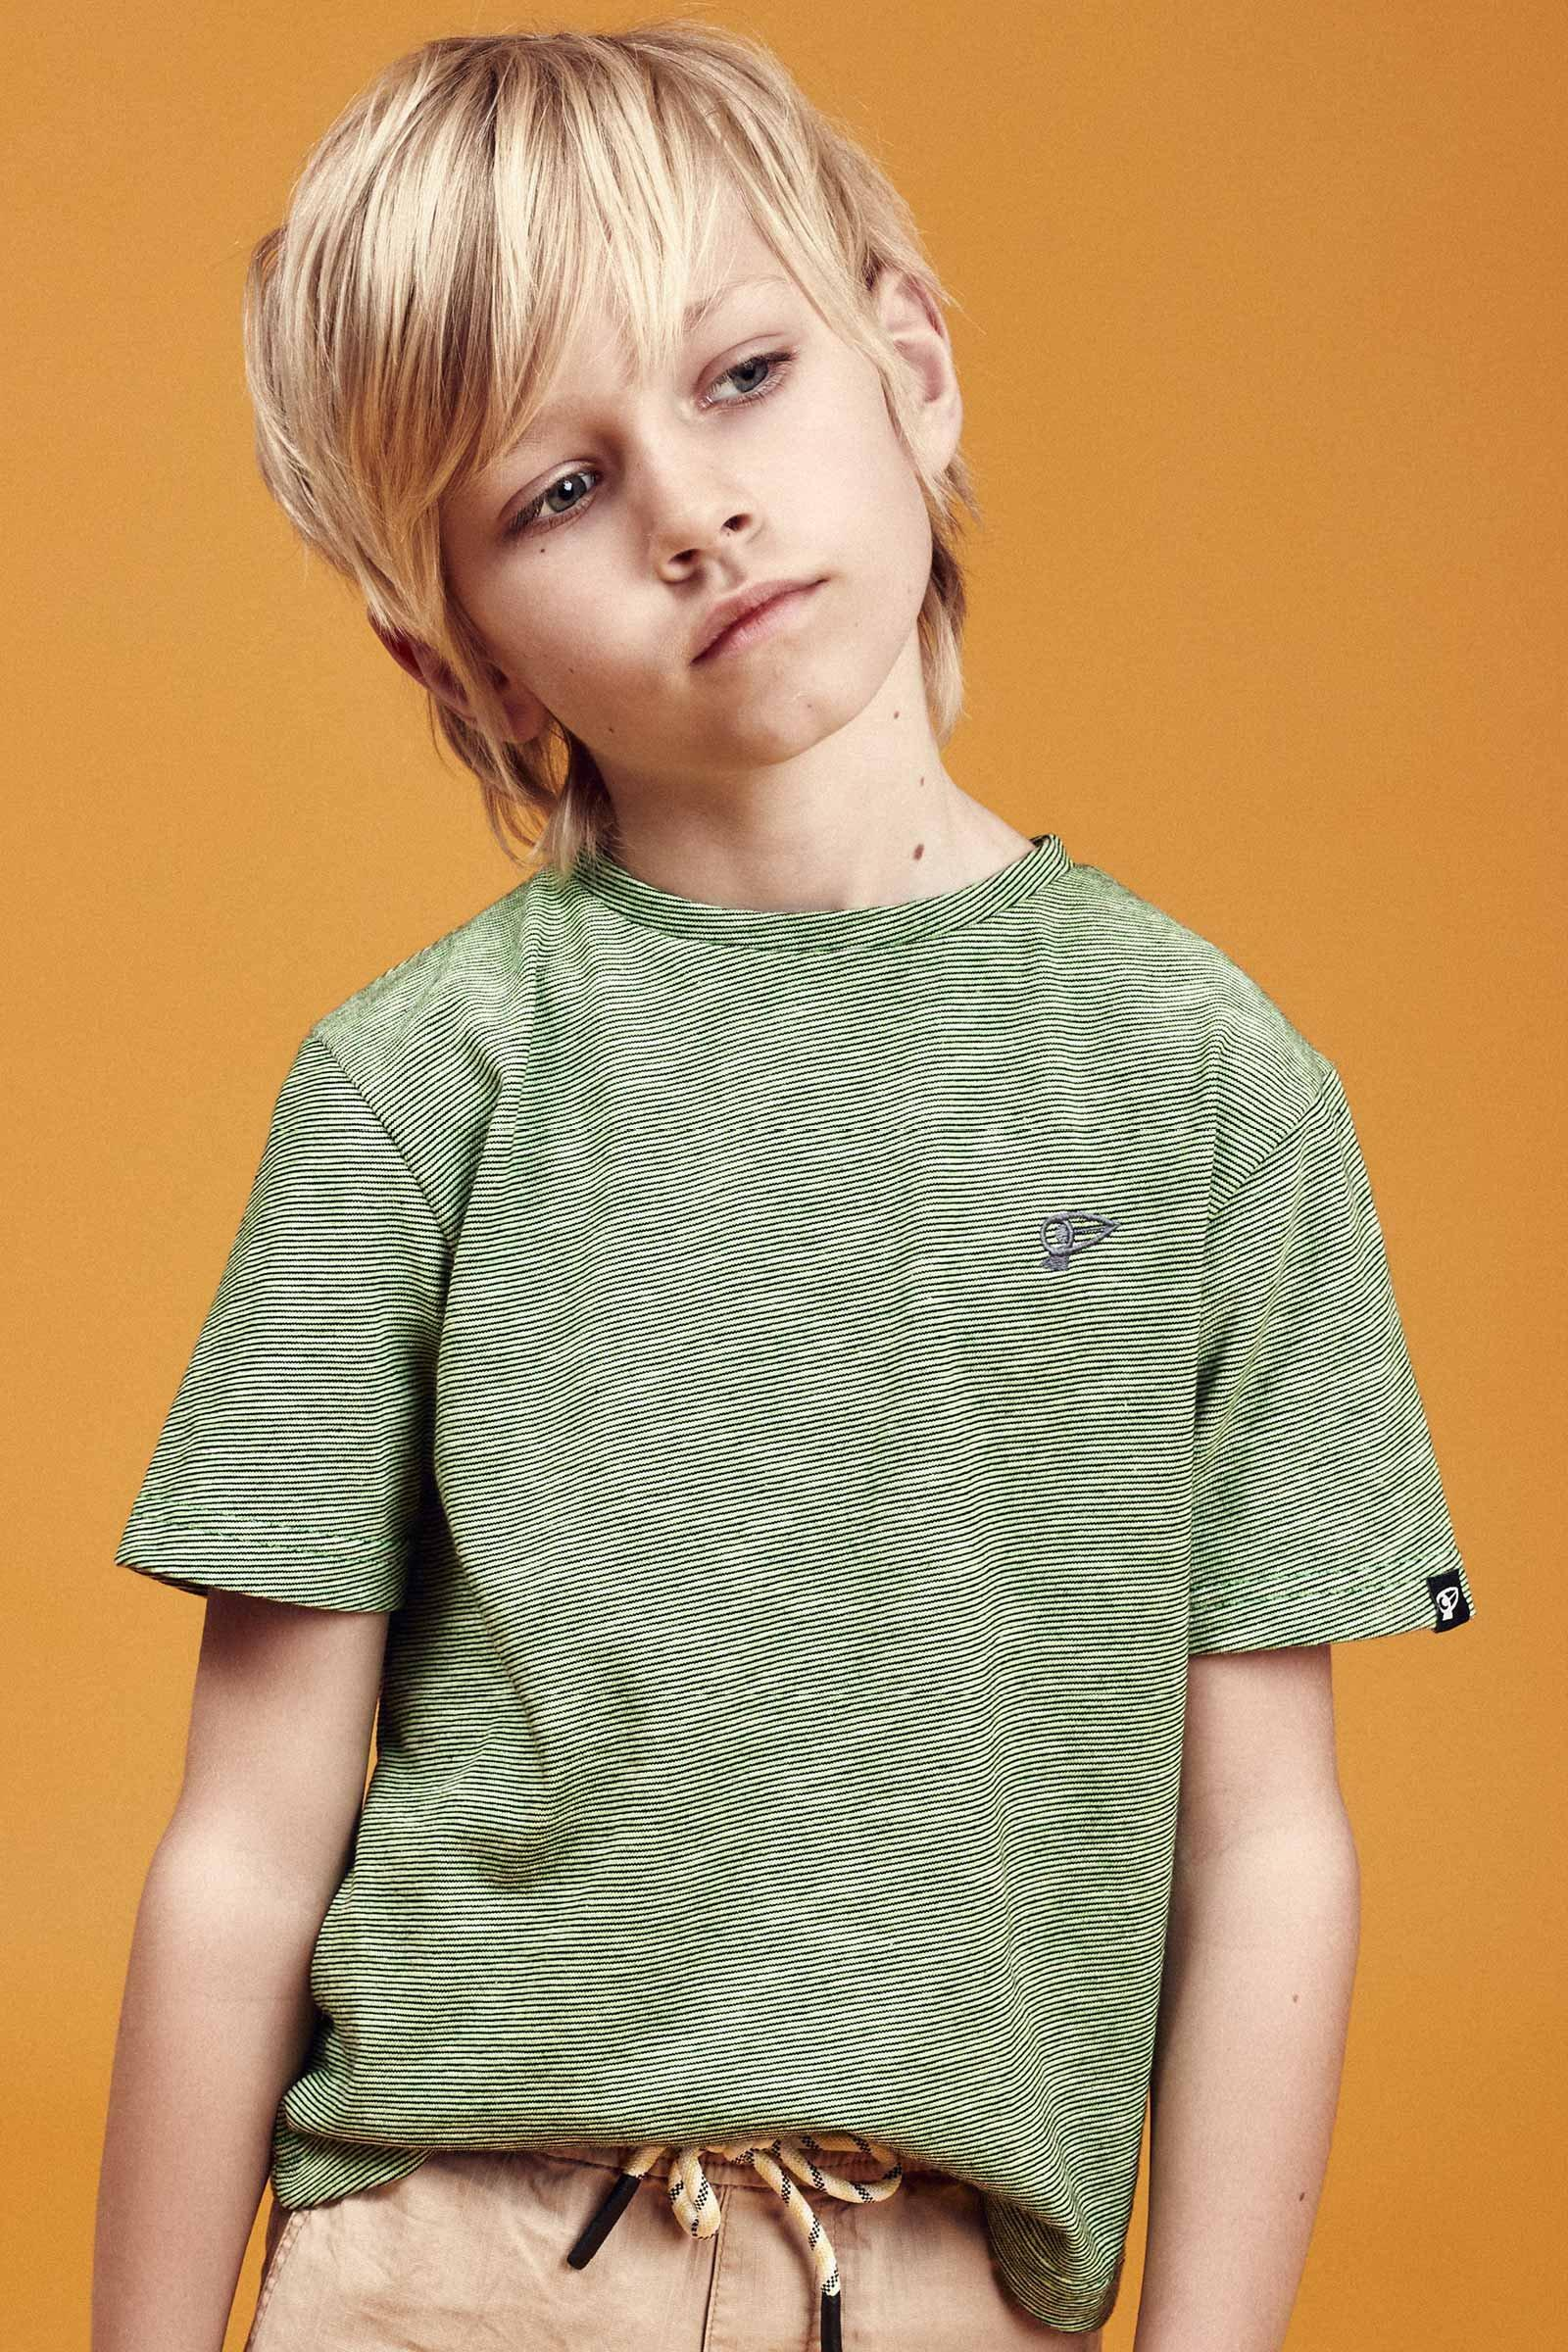 CKS Kids - YACKER - t-shirt korte mouwen - meerkleurig